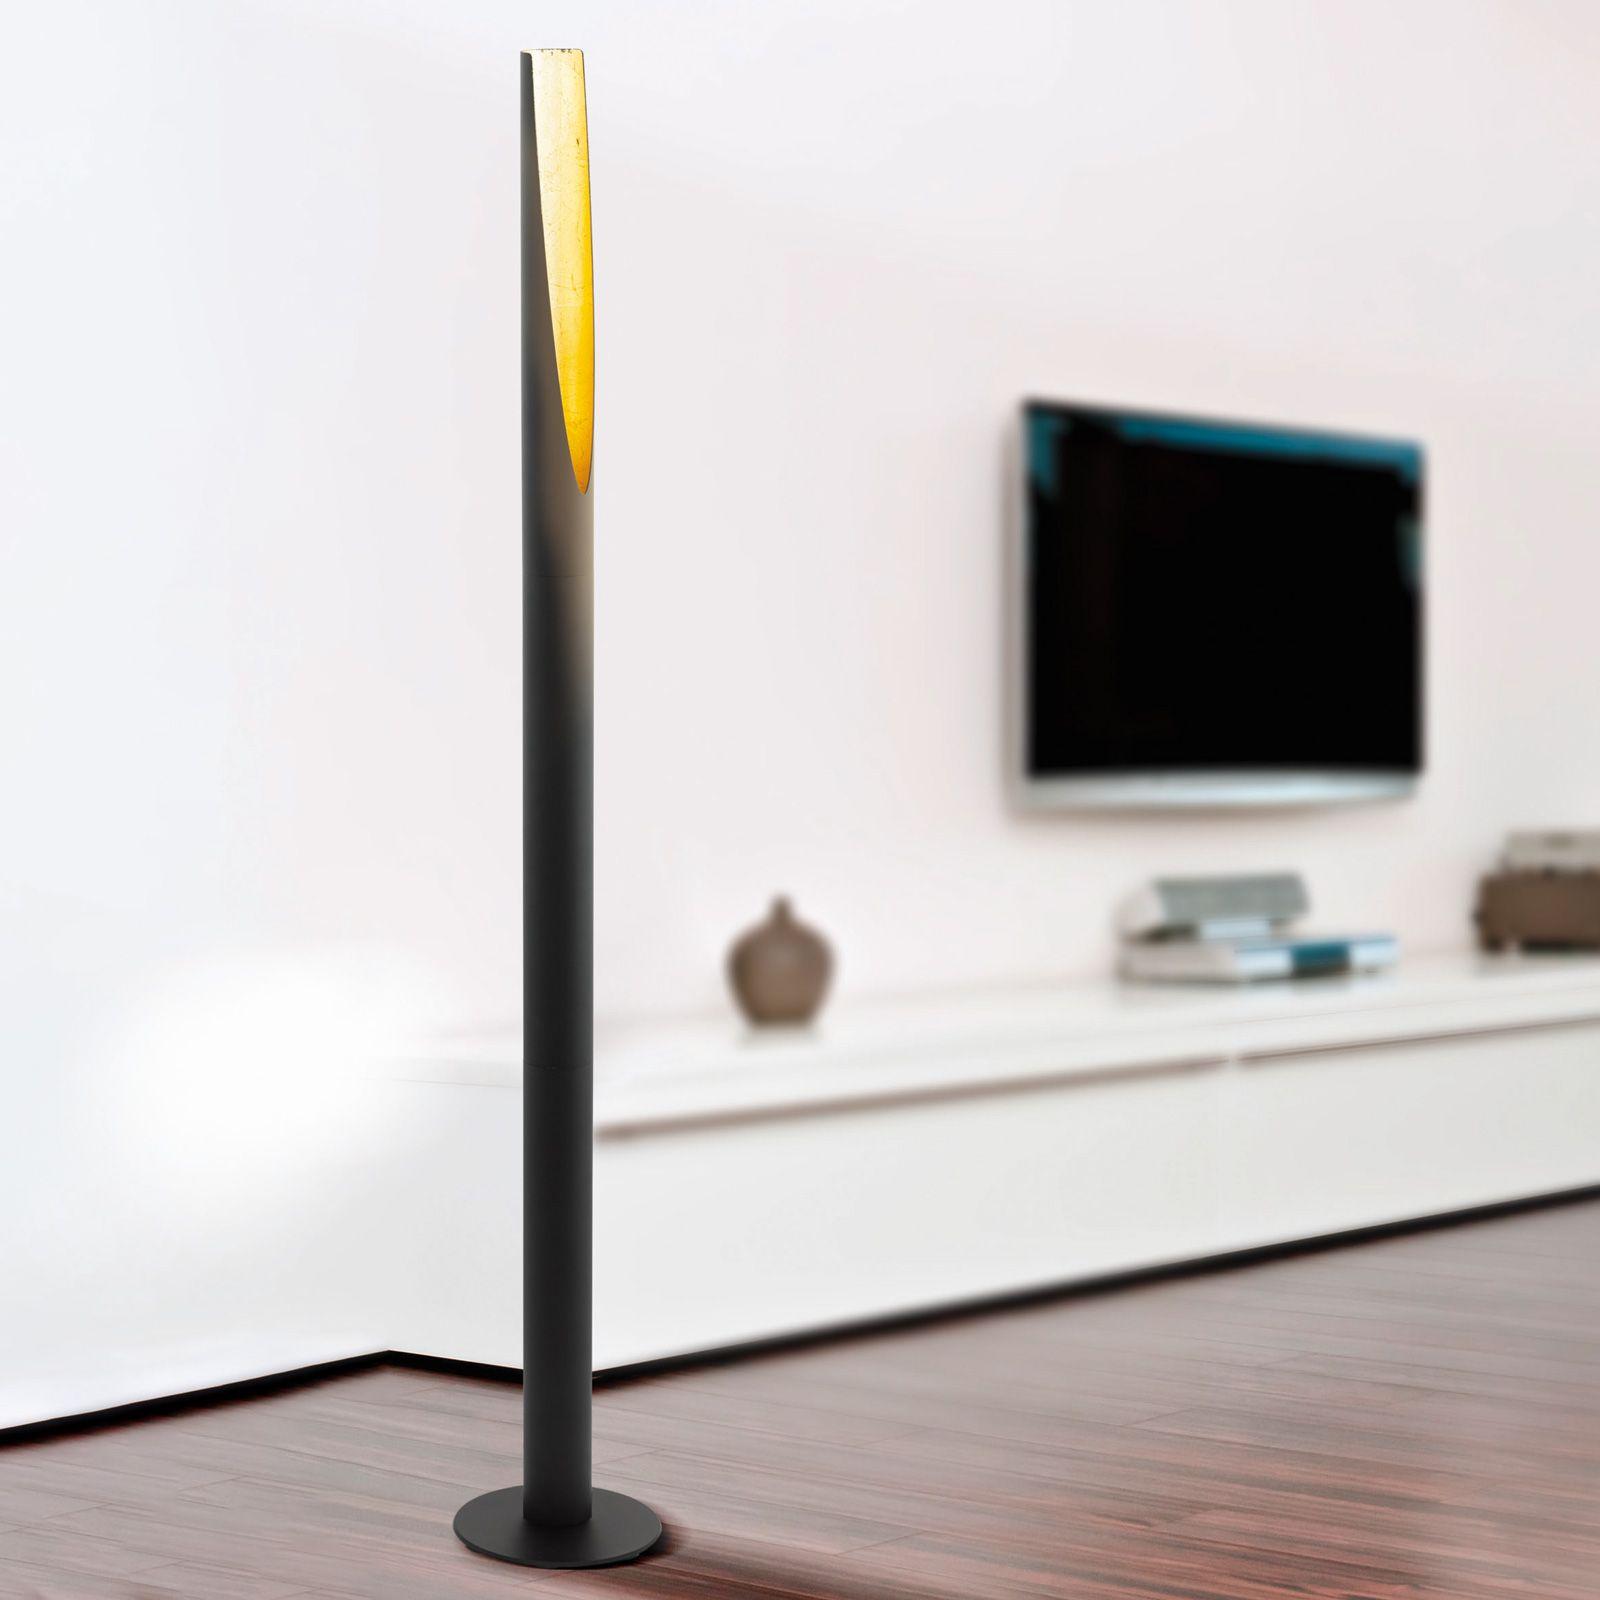 LED-voetlamp Barbotto in zwart/goud